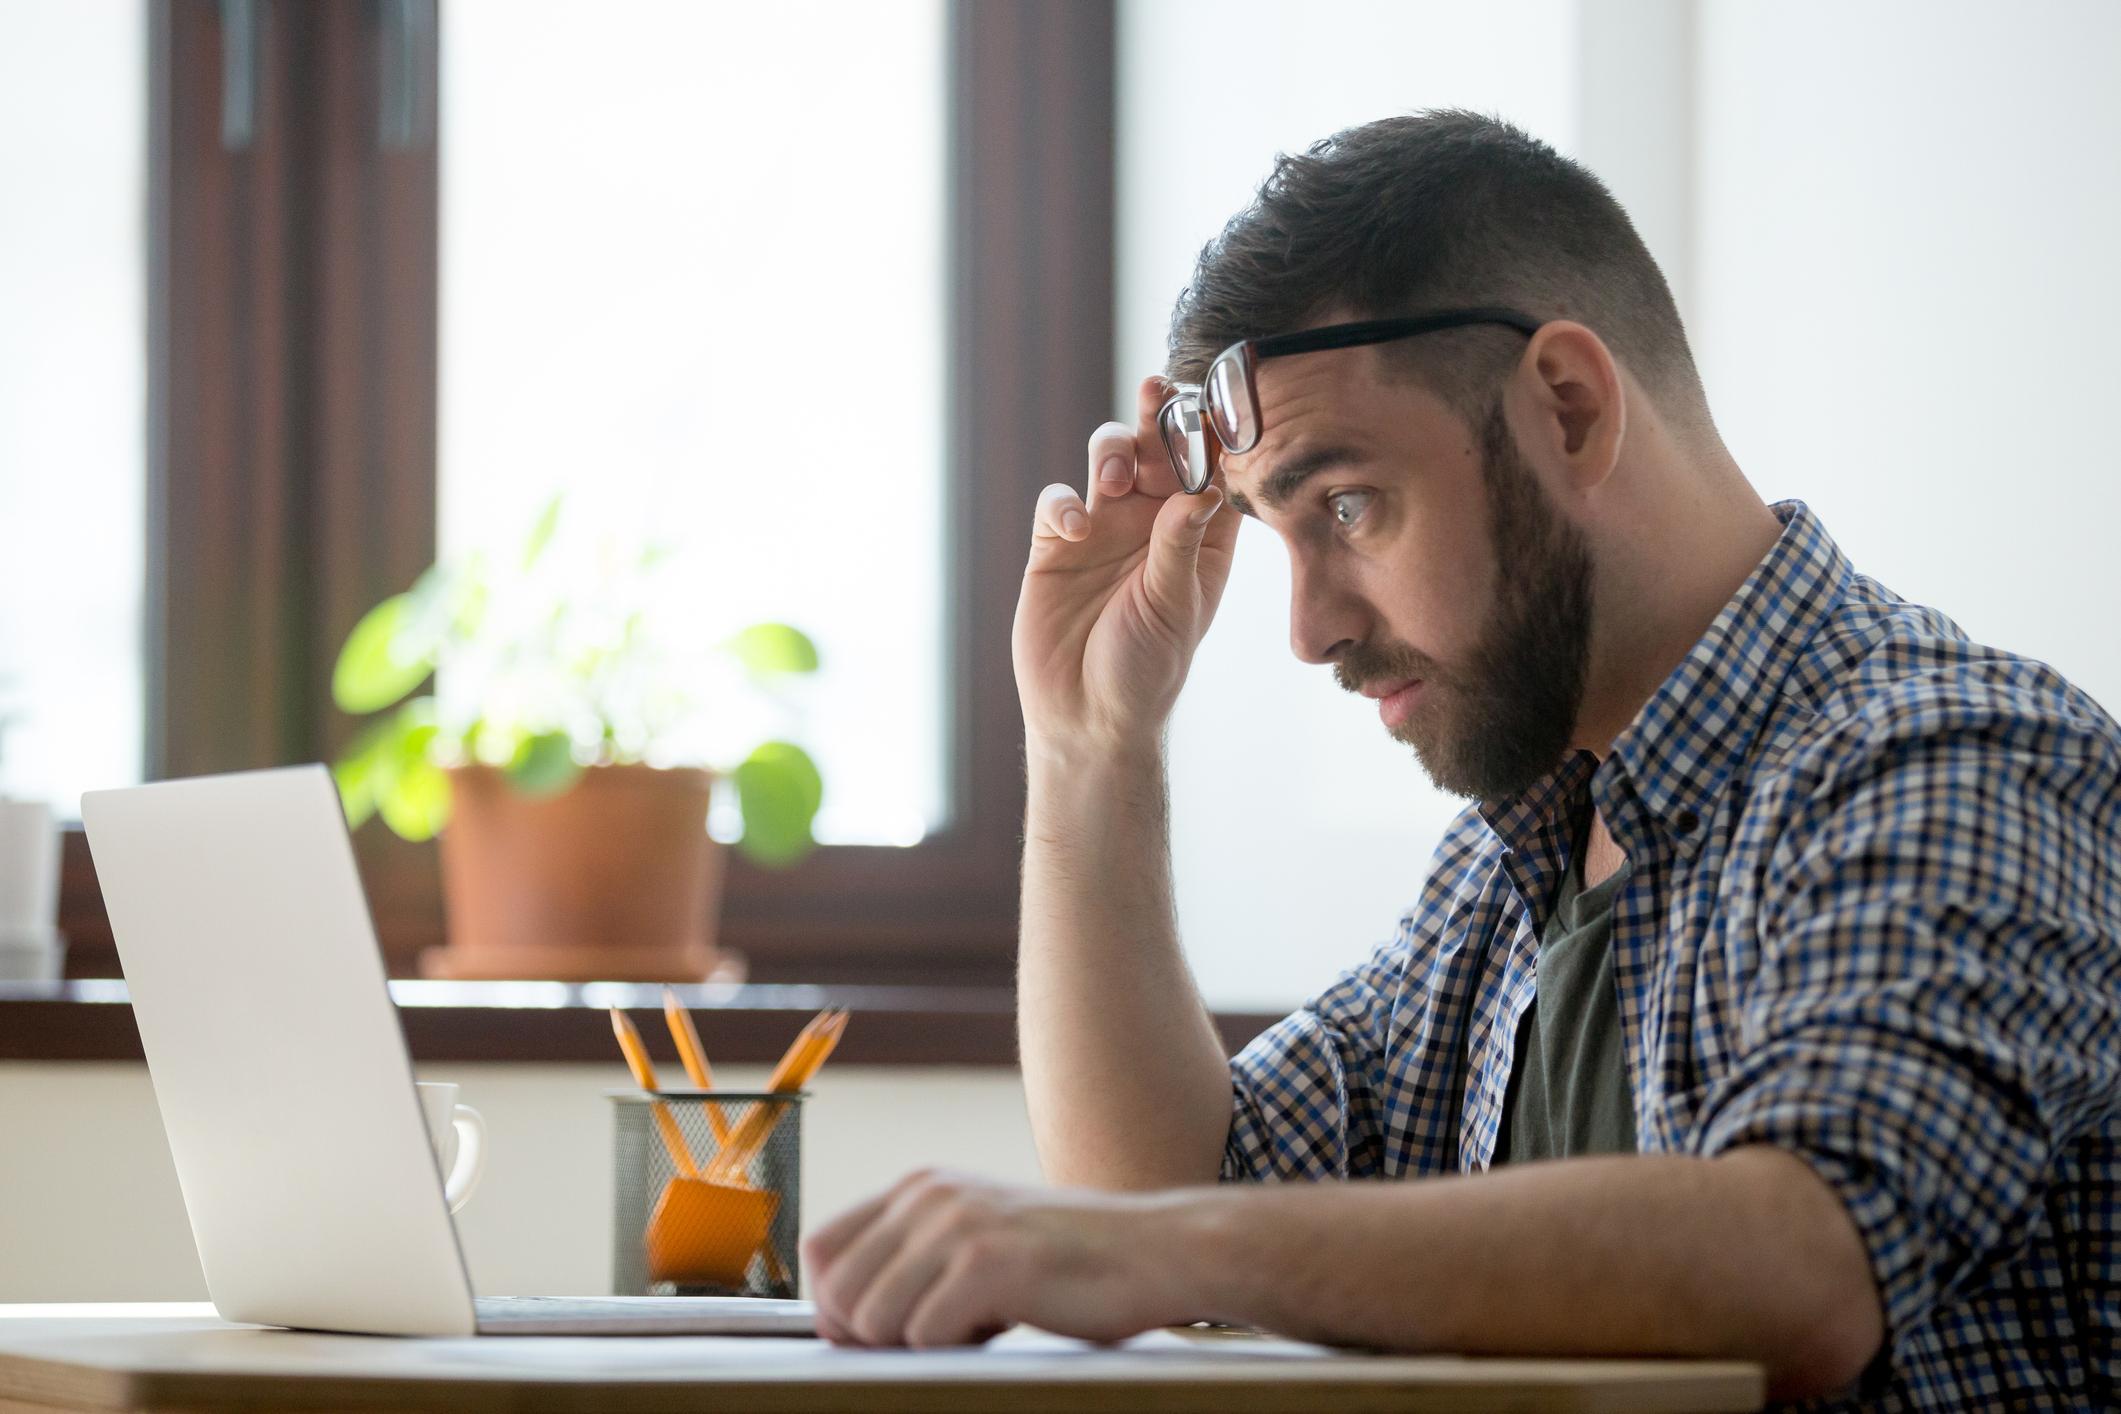 Worried man raising eyeglasses from his eyes while looking at his laptop.